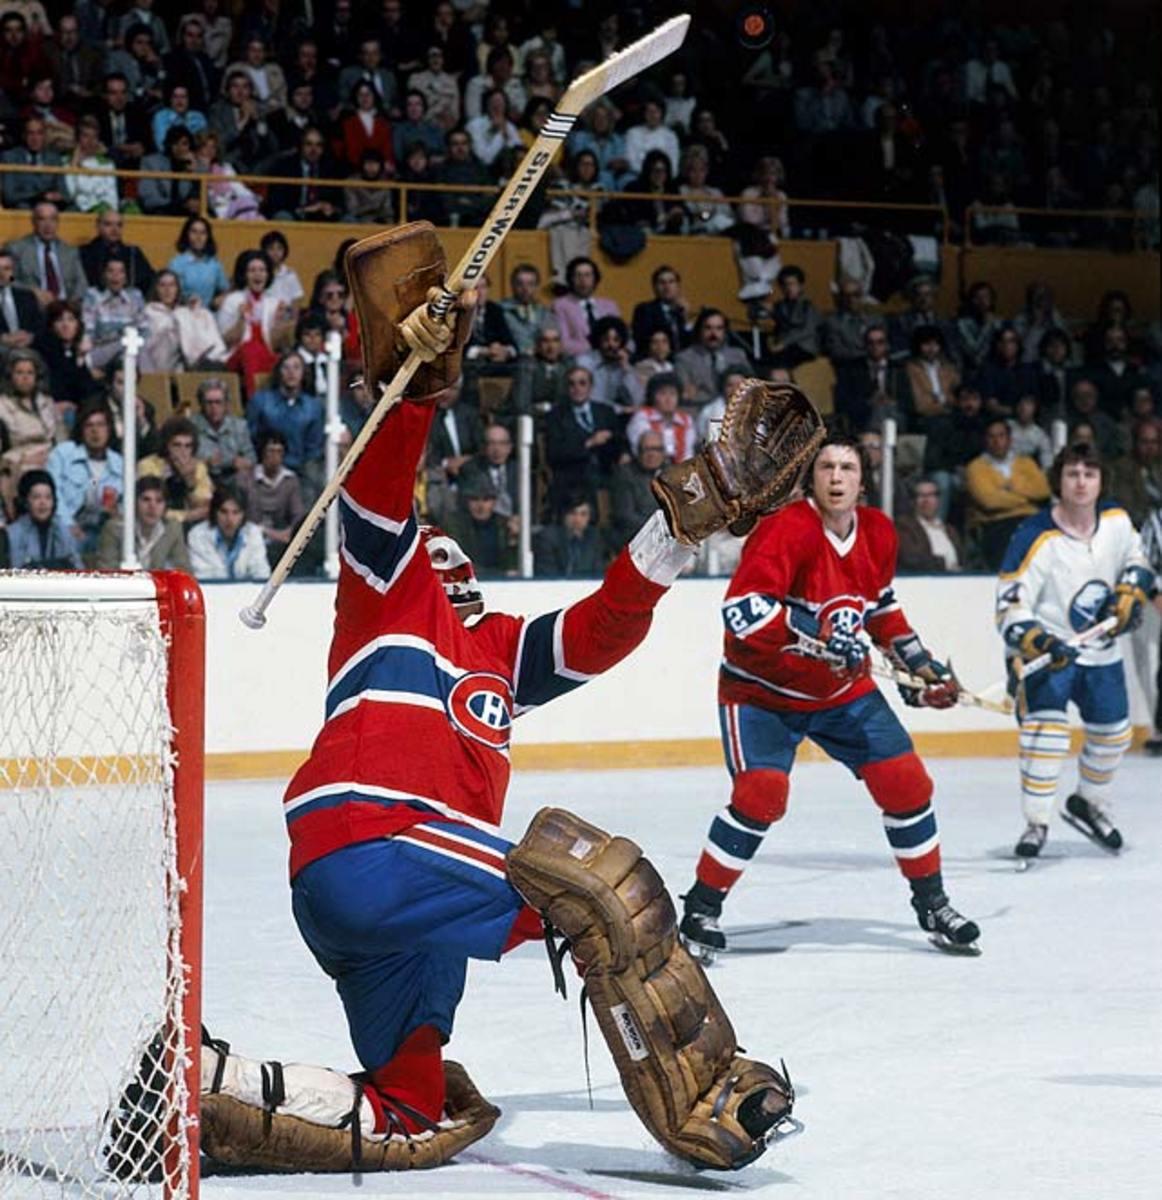 1974-75 Monteal Canadiens